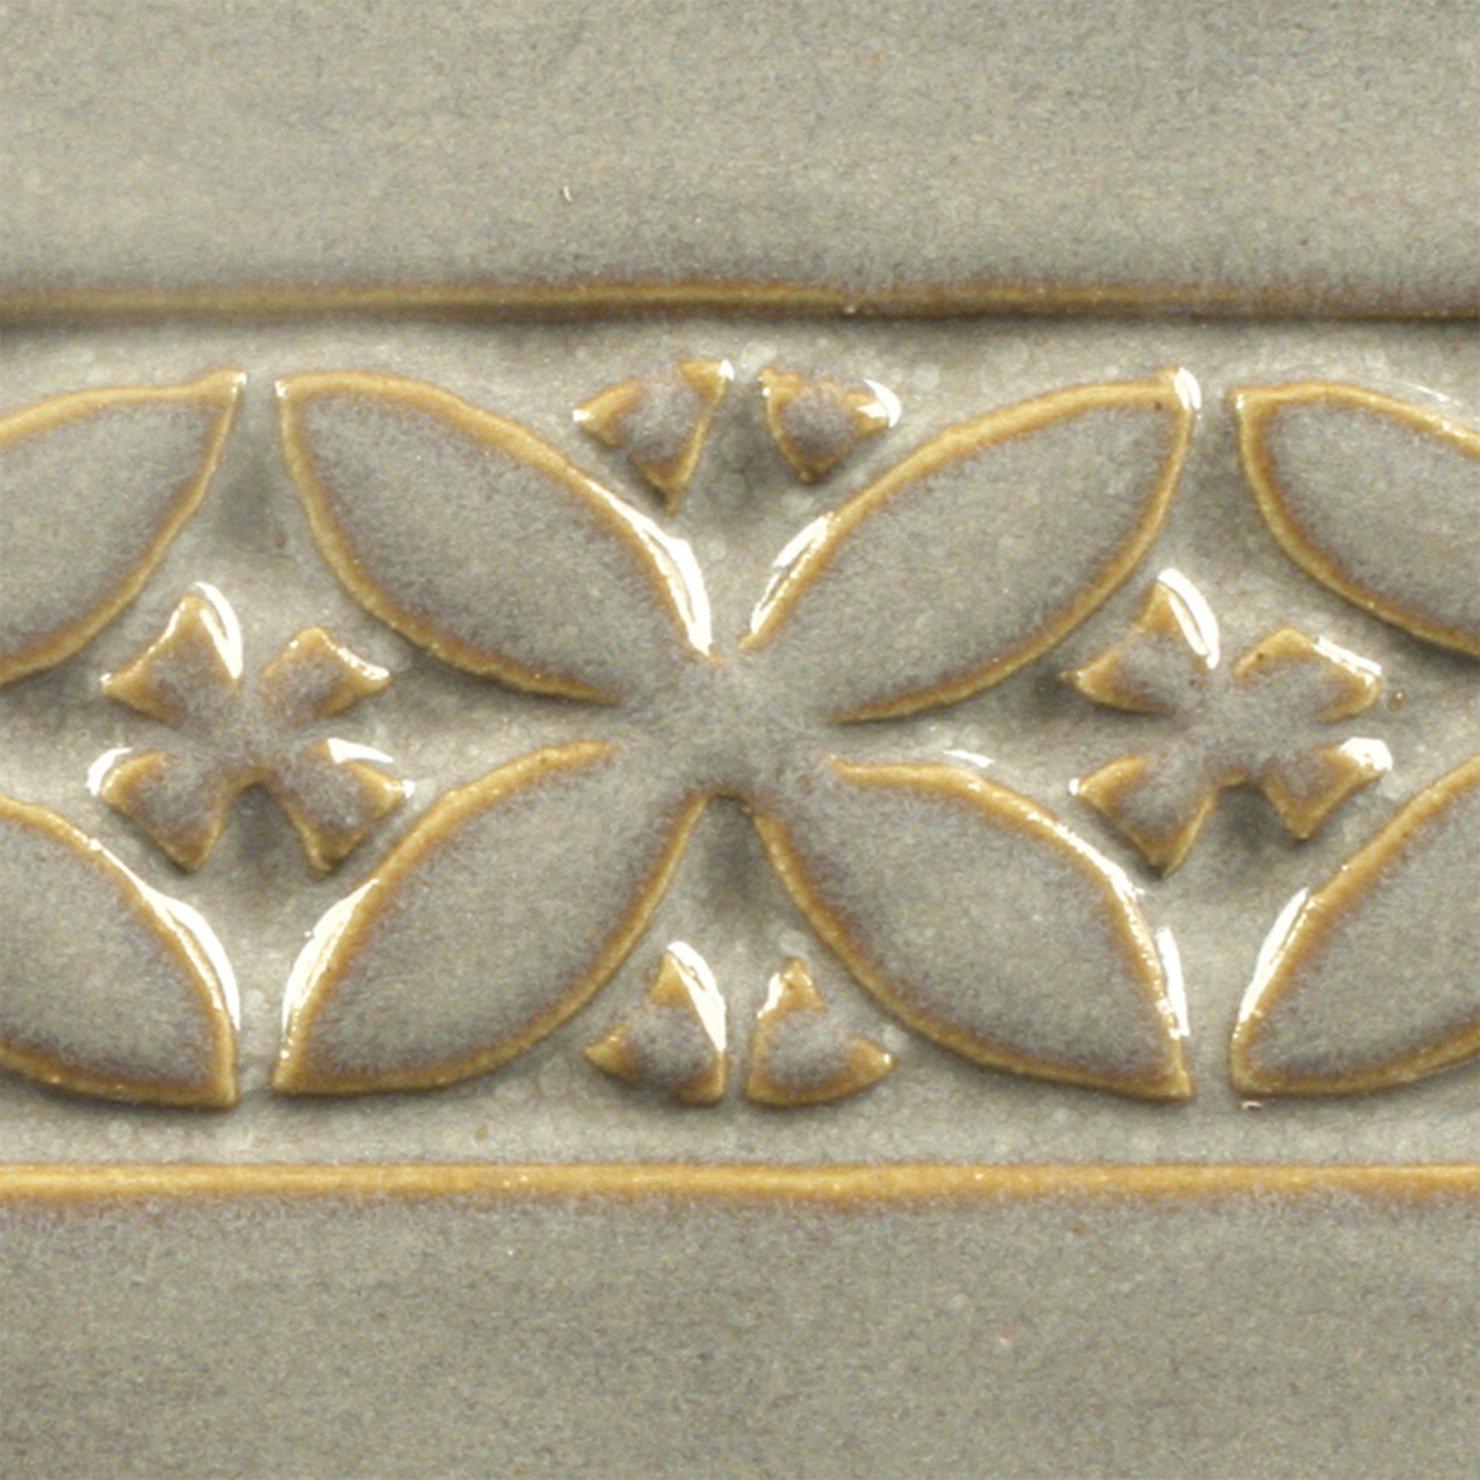 AMACO Potters Choice Lead-Free Non-Toxic Glaze, 1 pt, Light Sepia PC-34